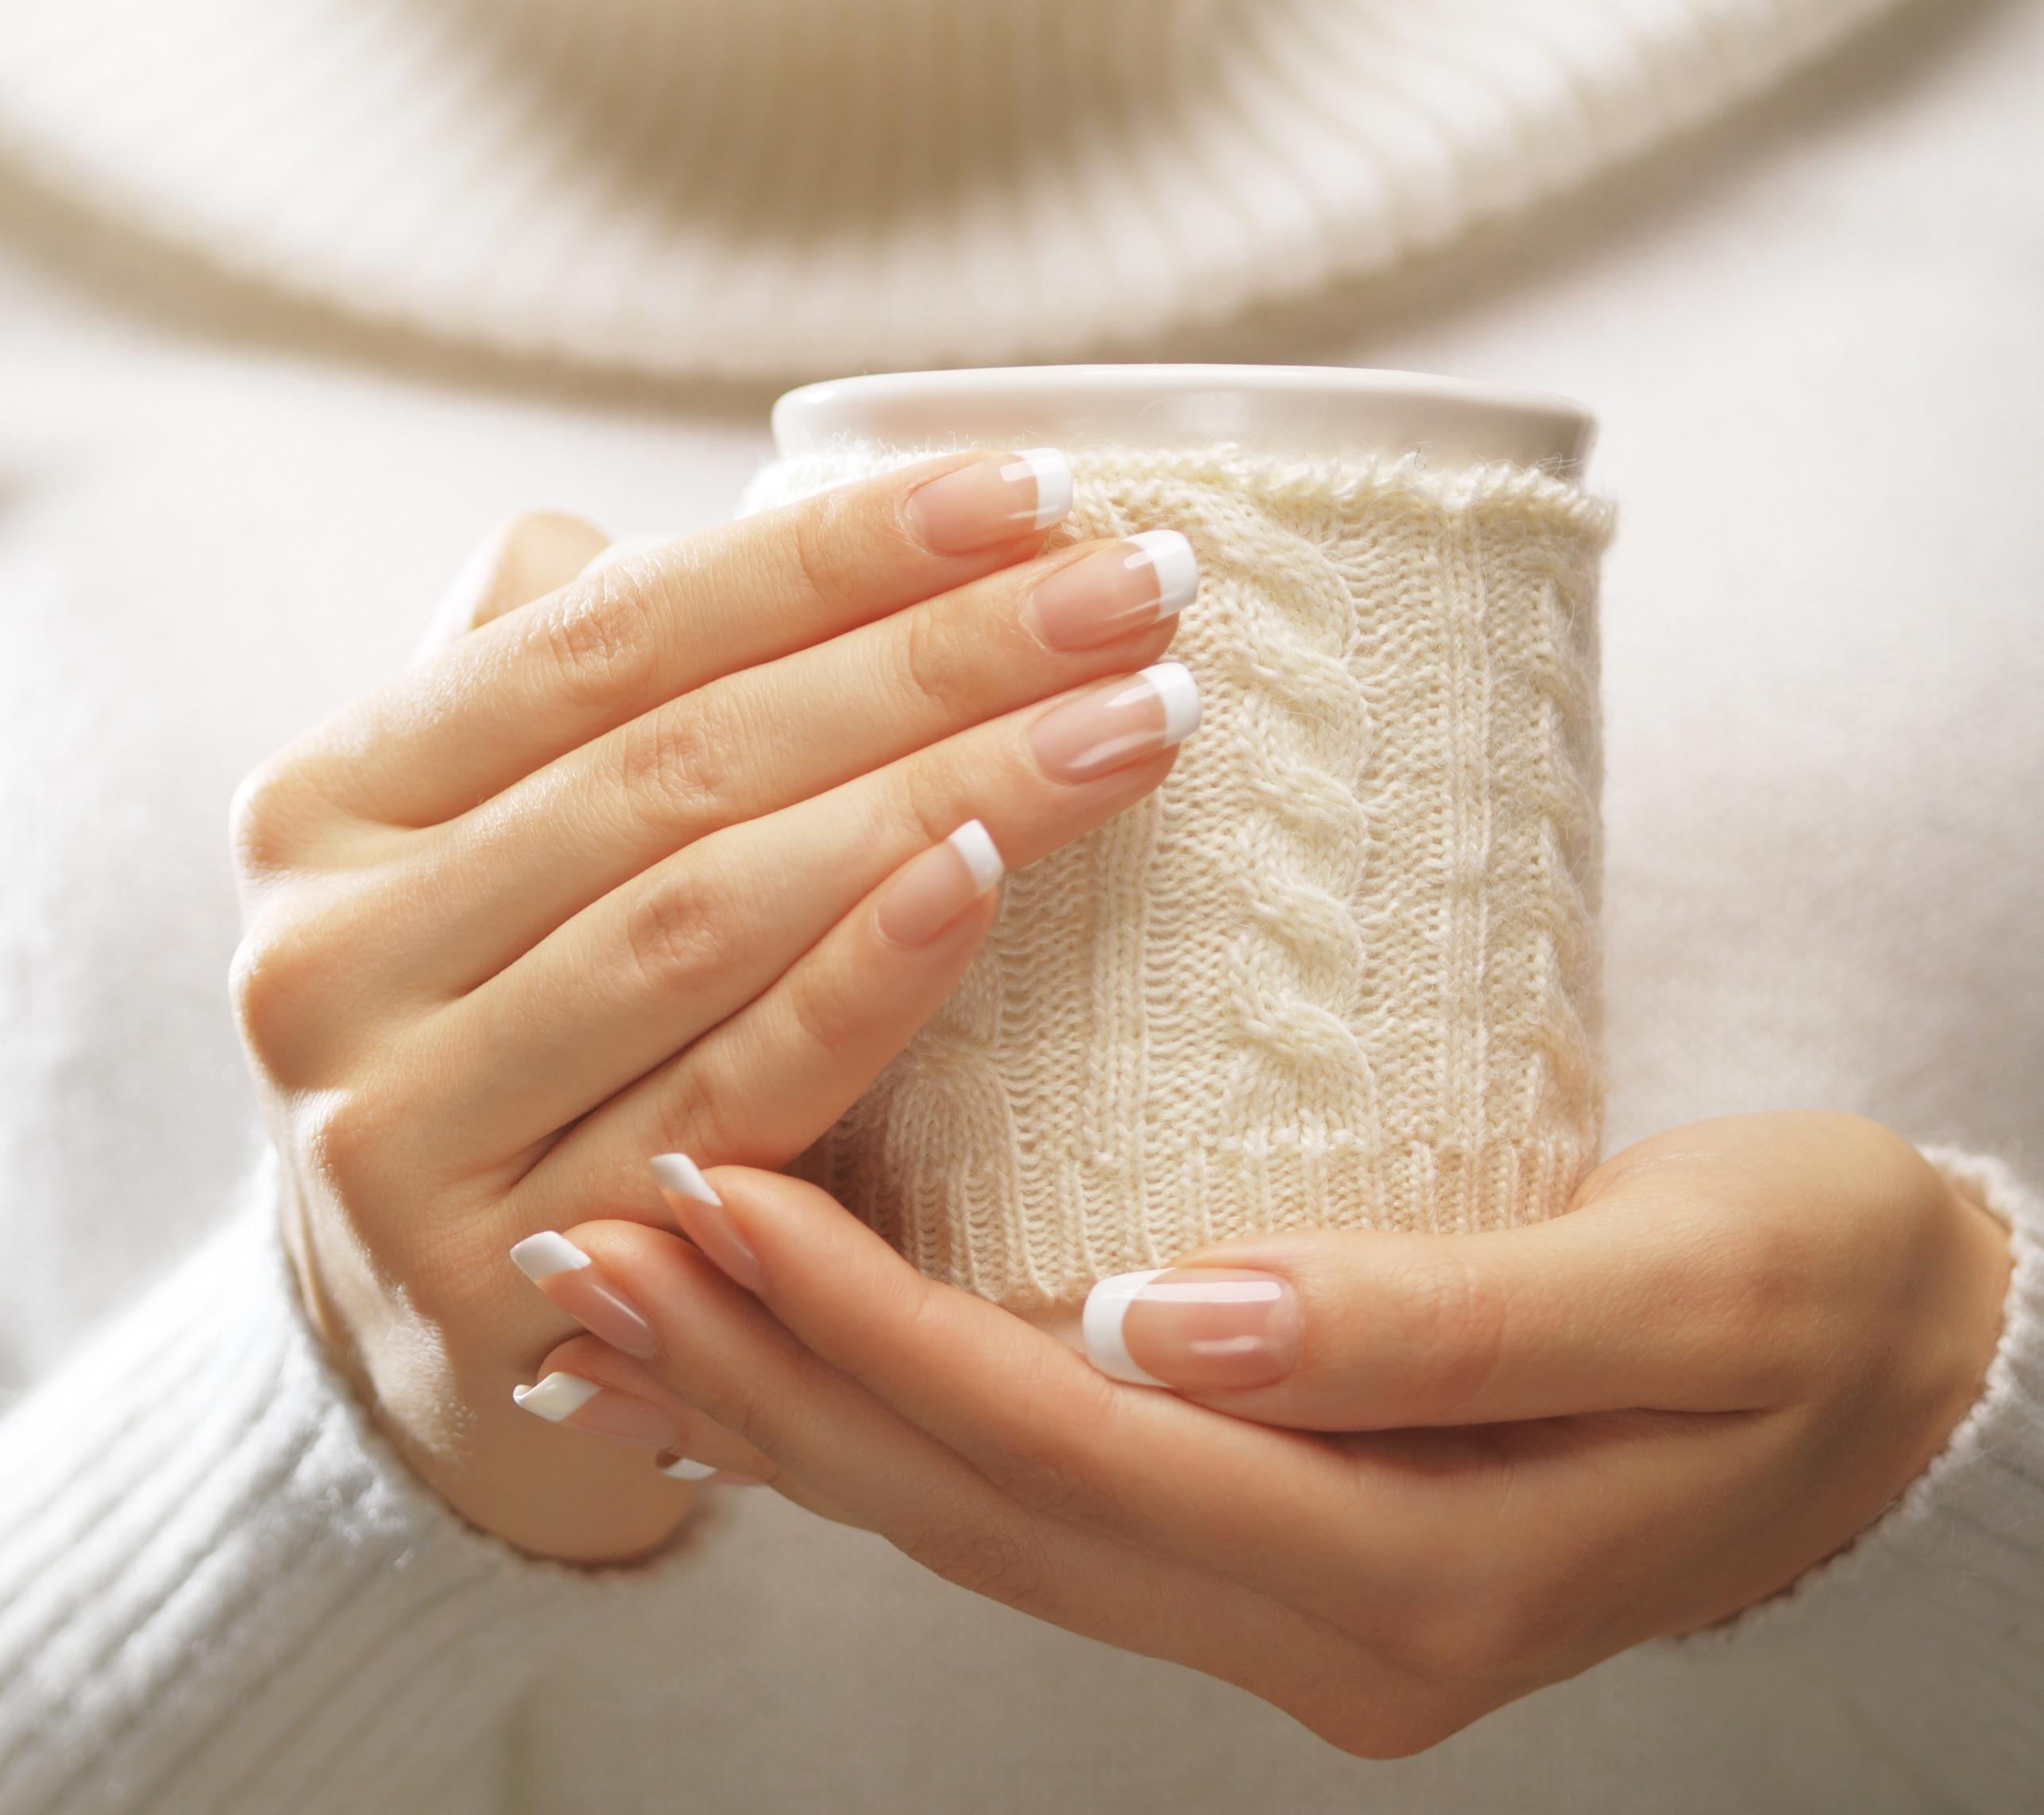 French manicure design